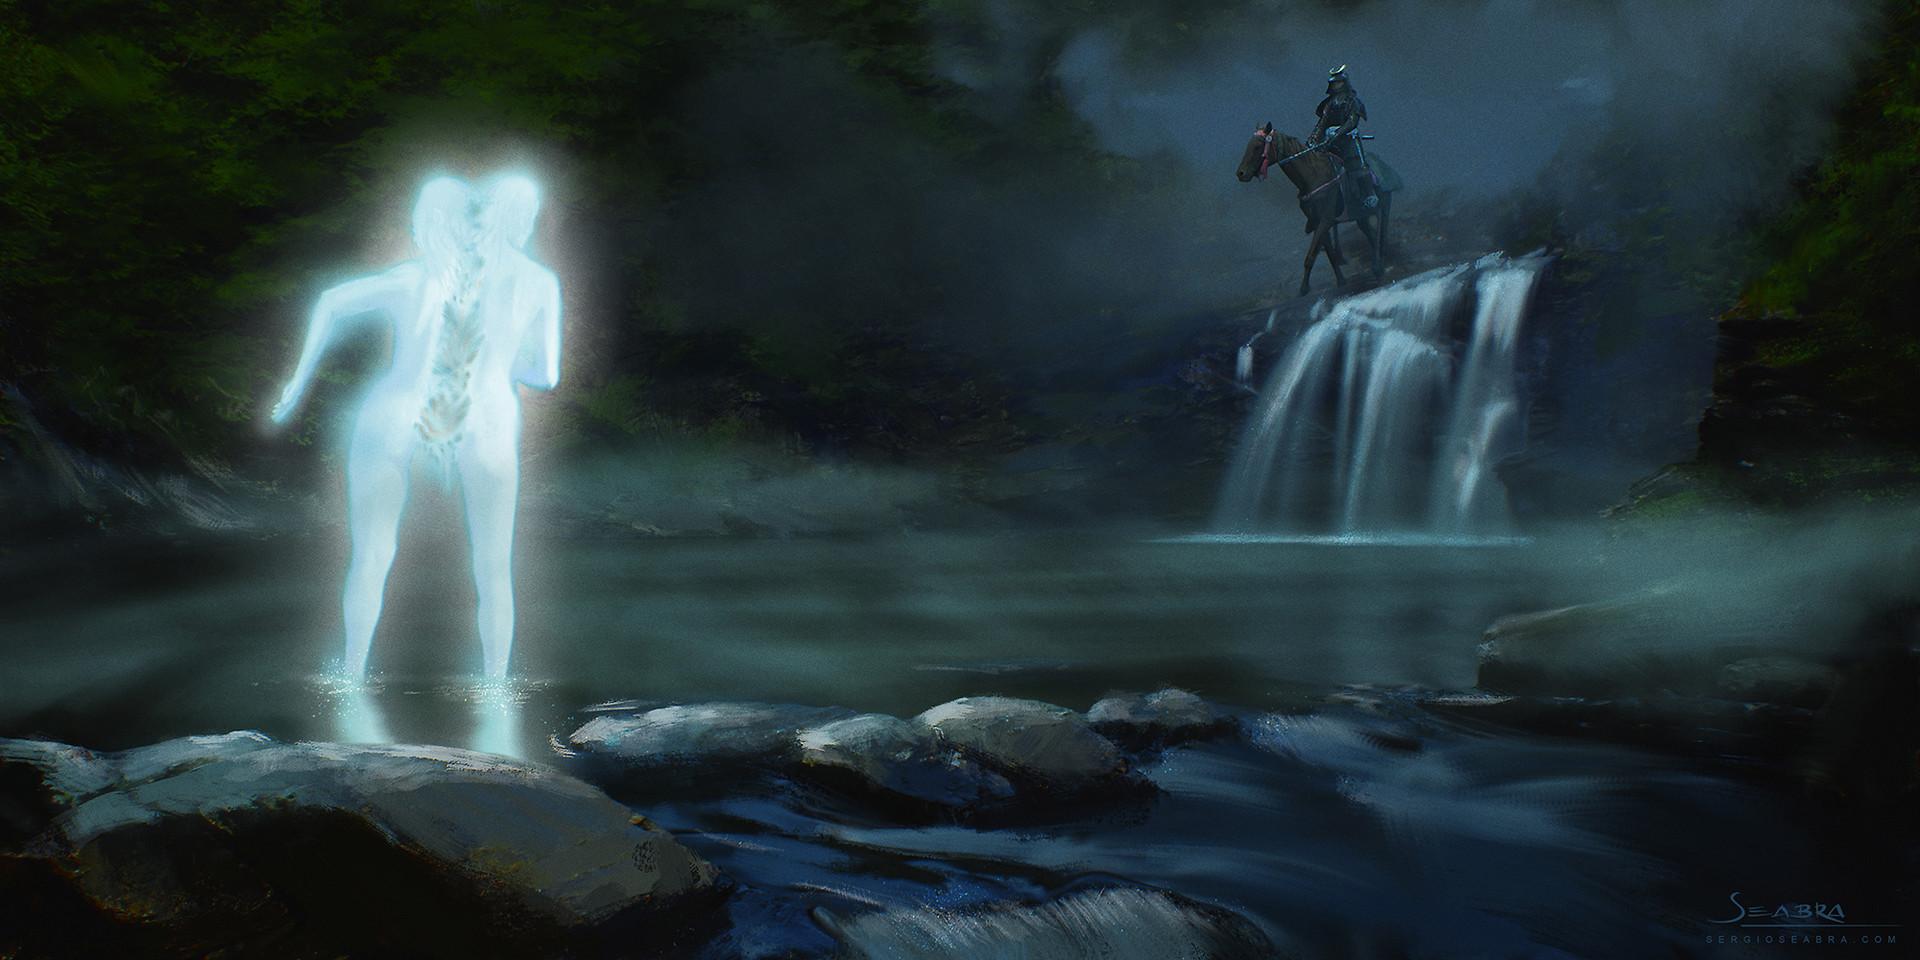 Sergio seabra 20170403 spirit of the river finalweb